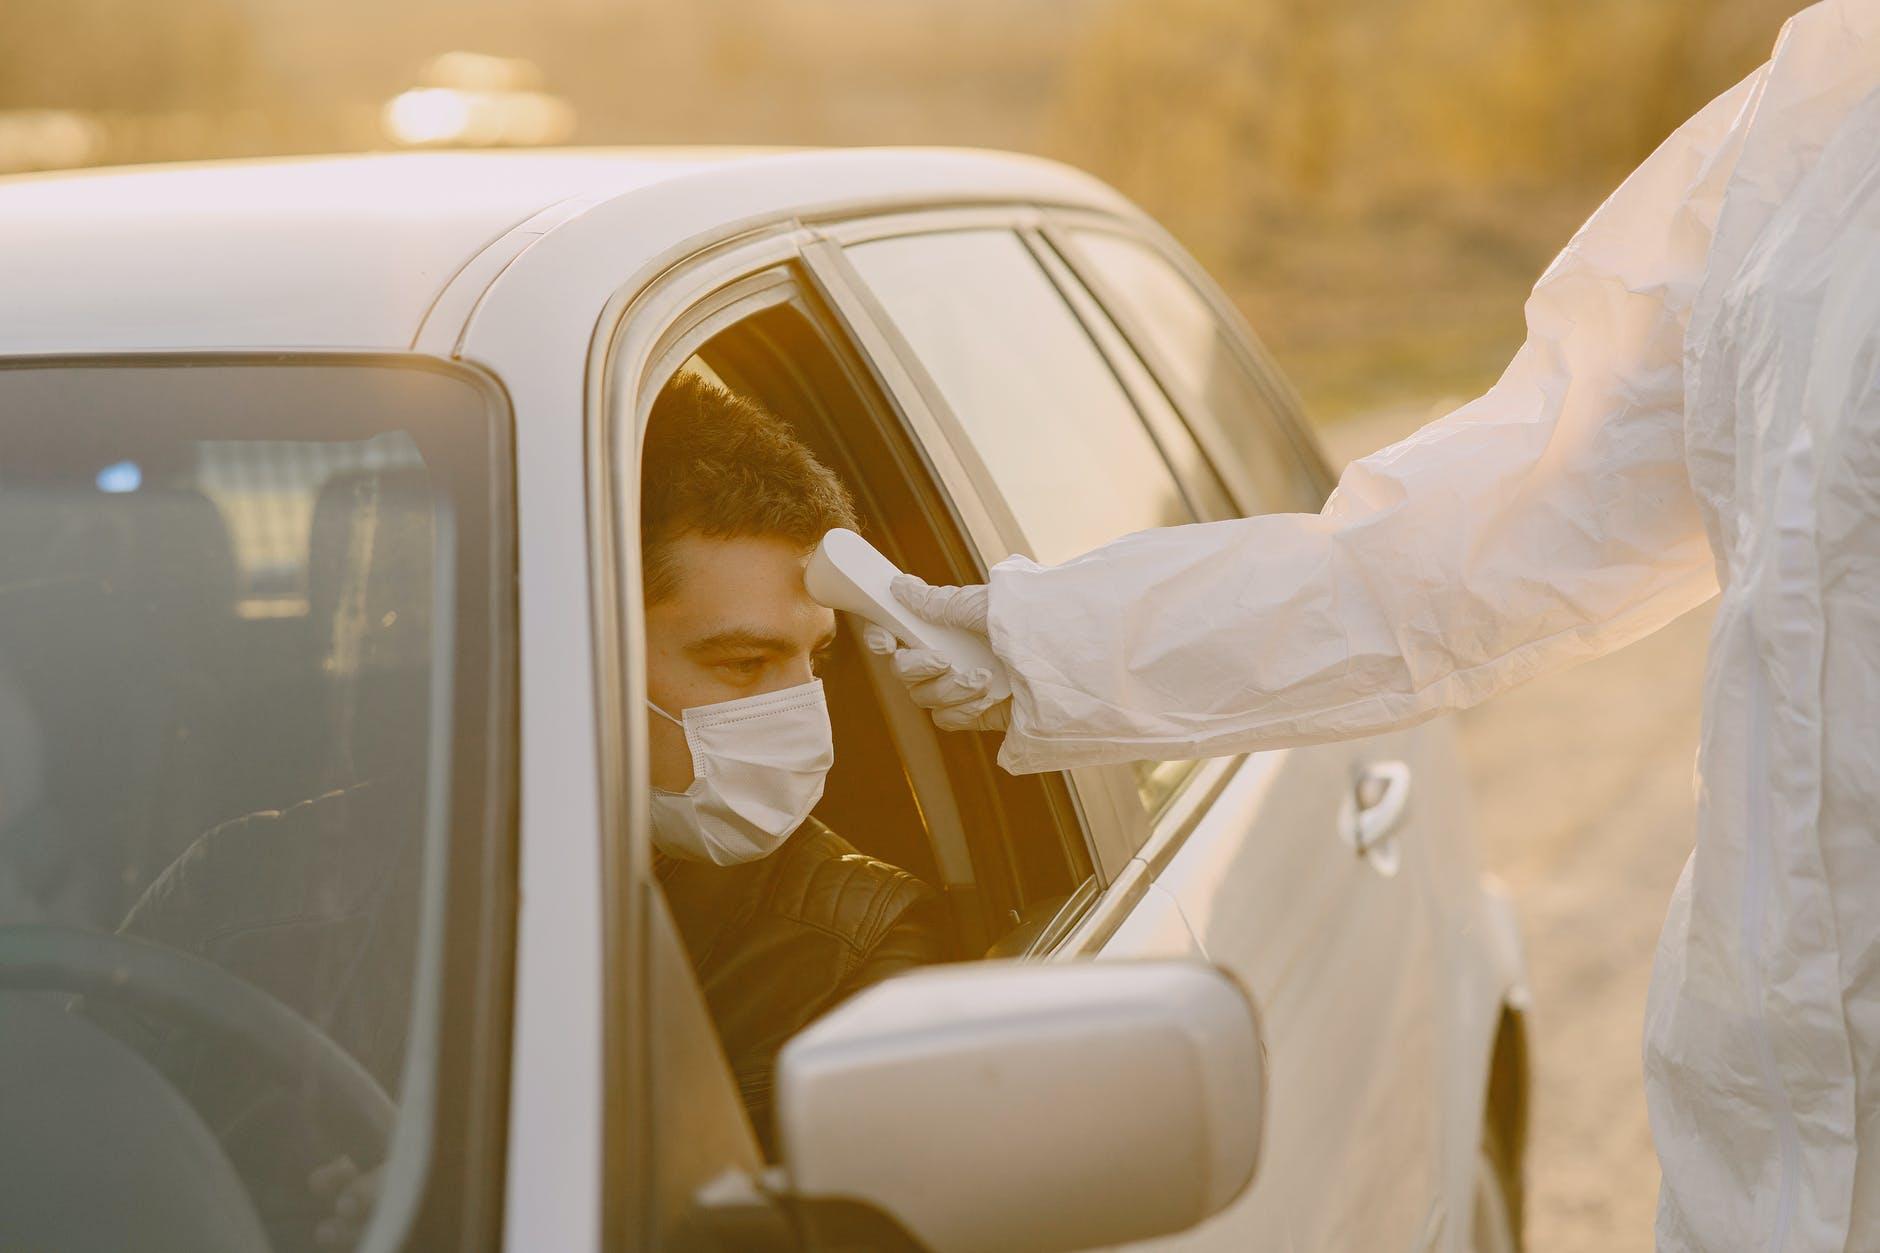 Italian Medical Association demands end to Corona Lock-Down